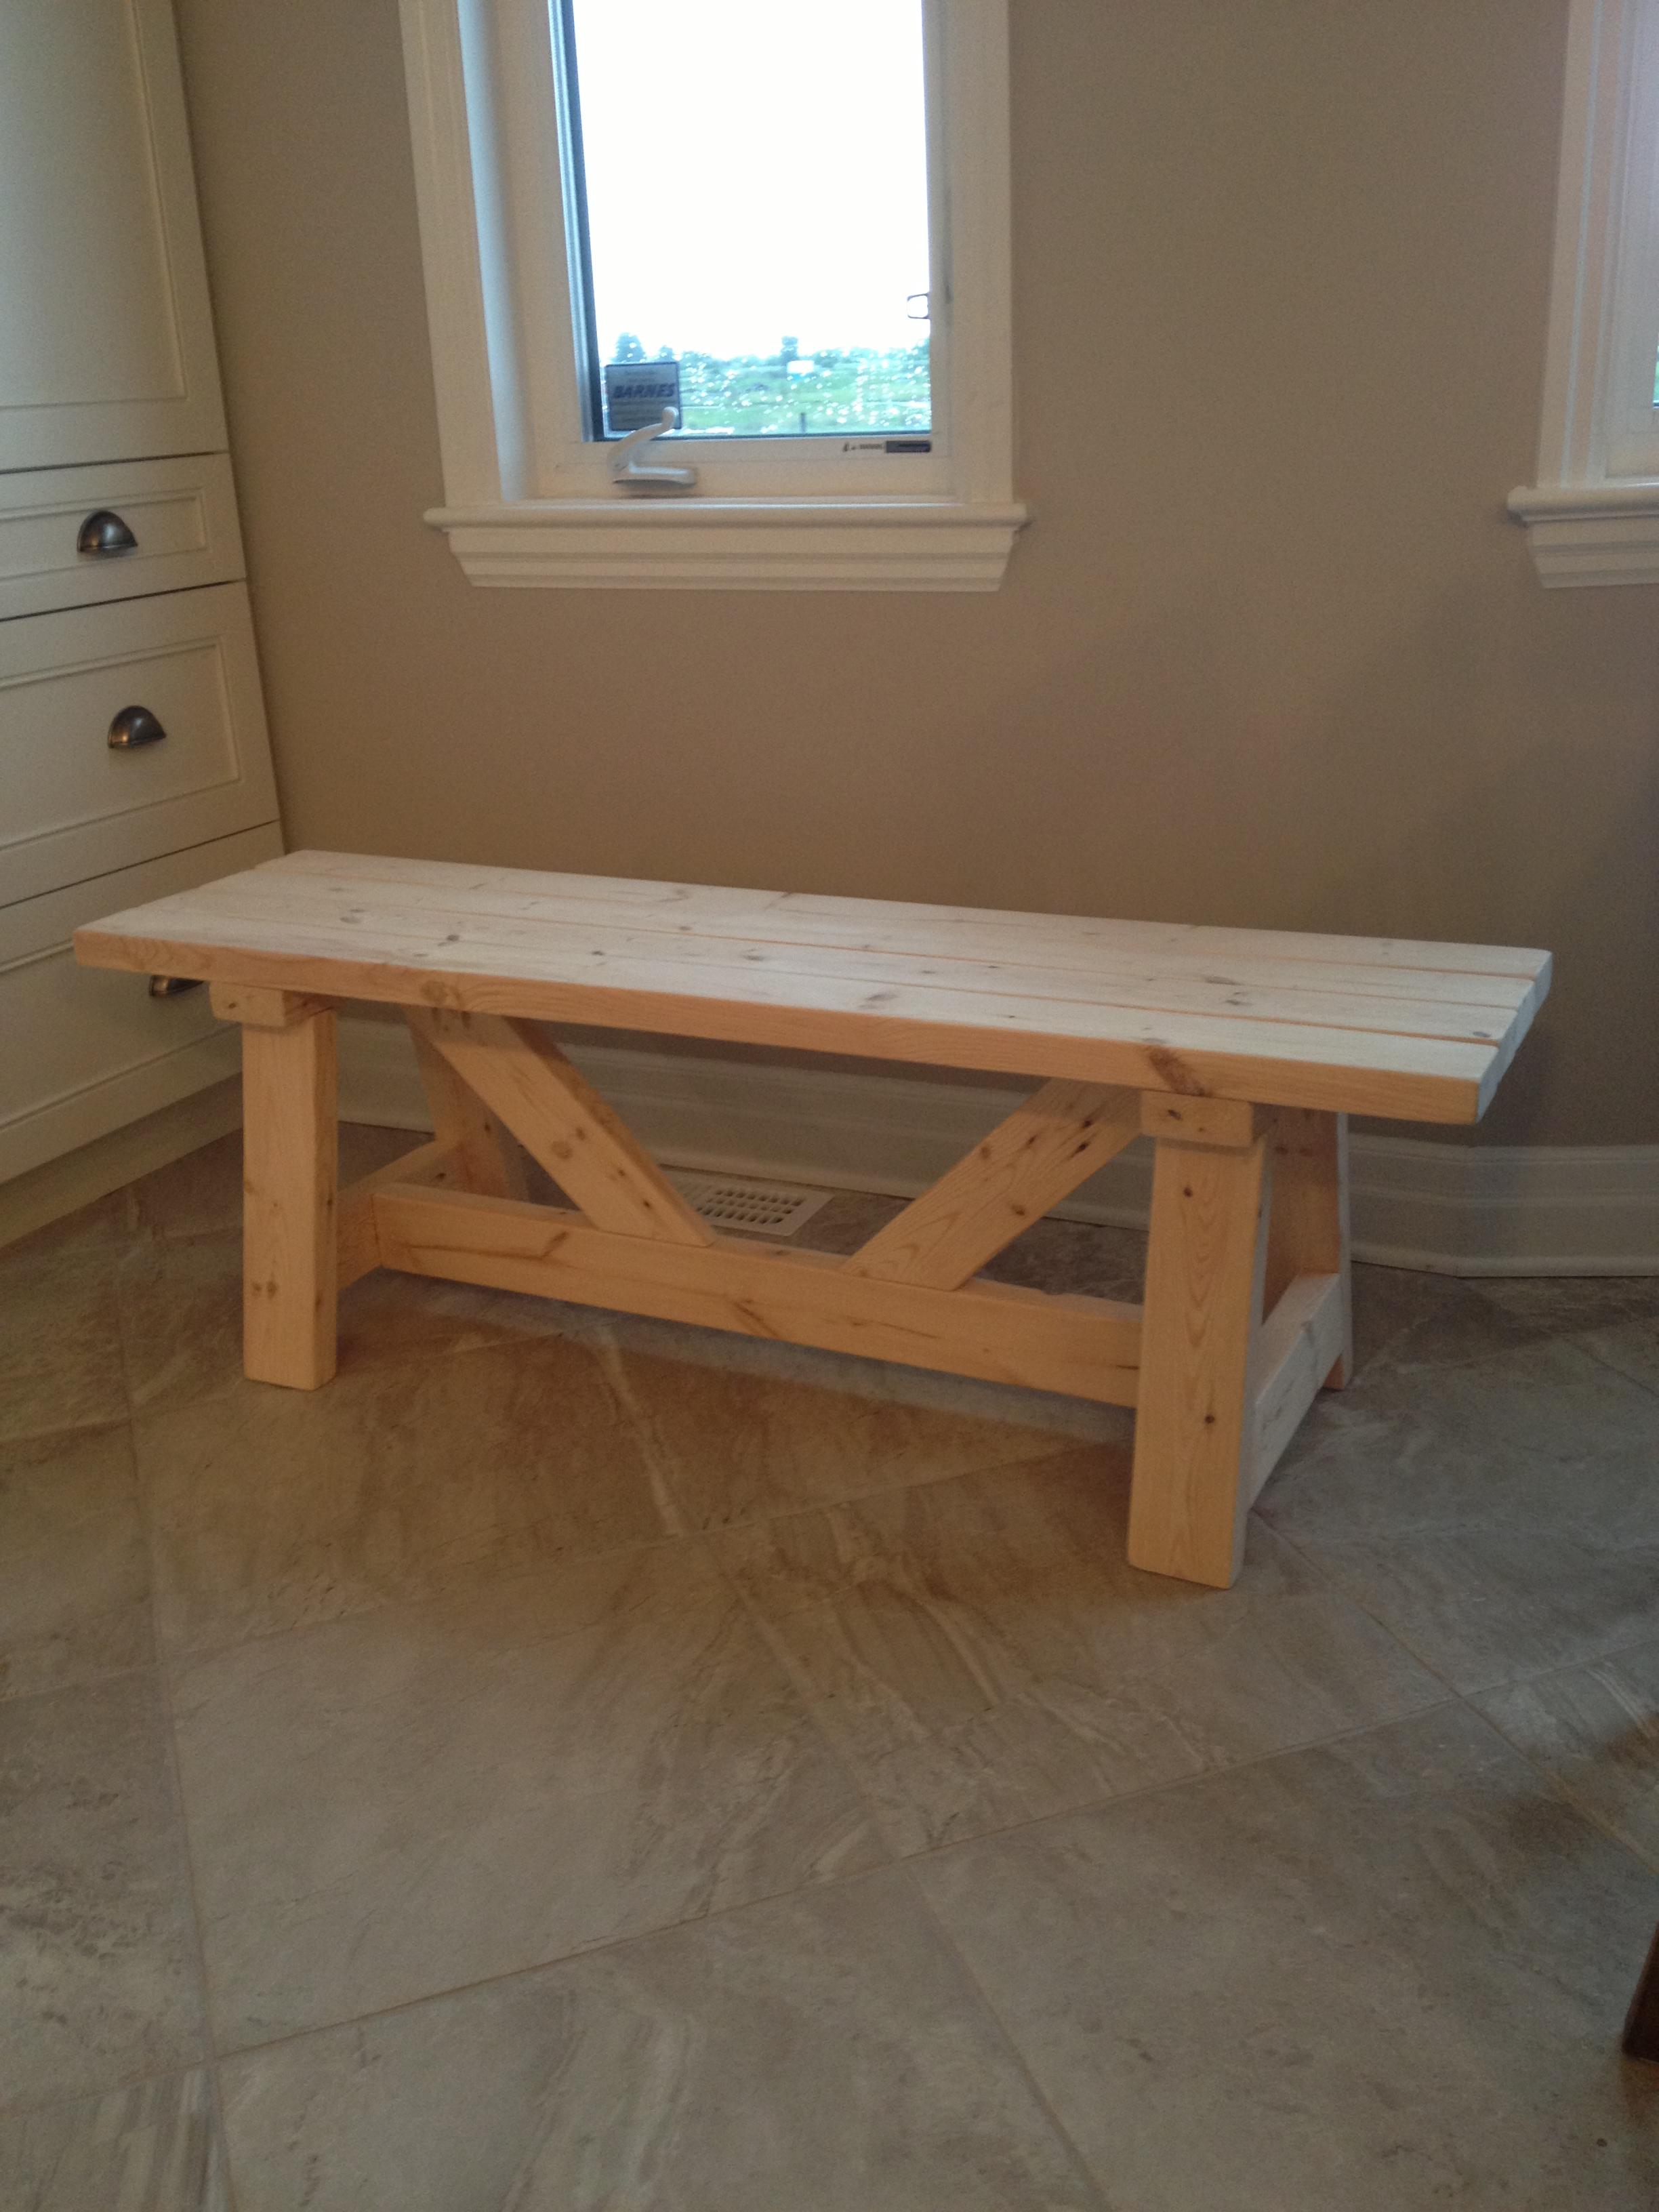 Sensational Farmhouse Bench In 1 Day Ana White Cjindustries Chair Design For Home Cjindustriesco